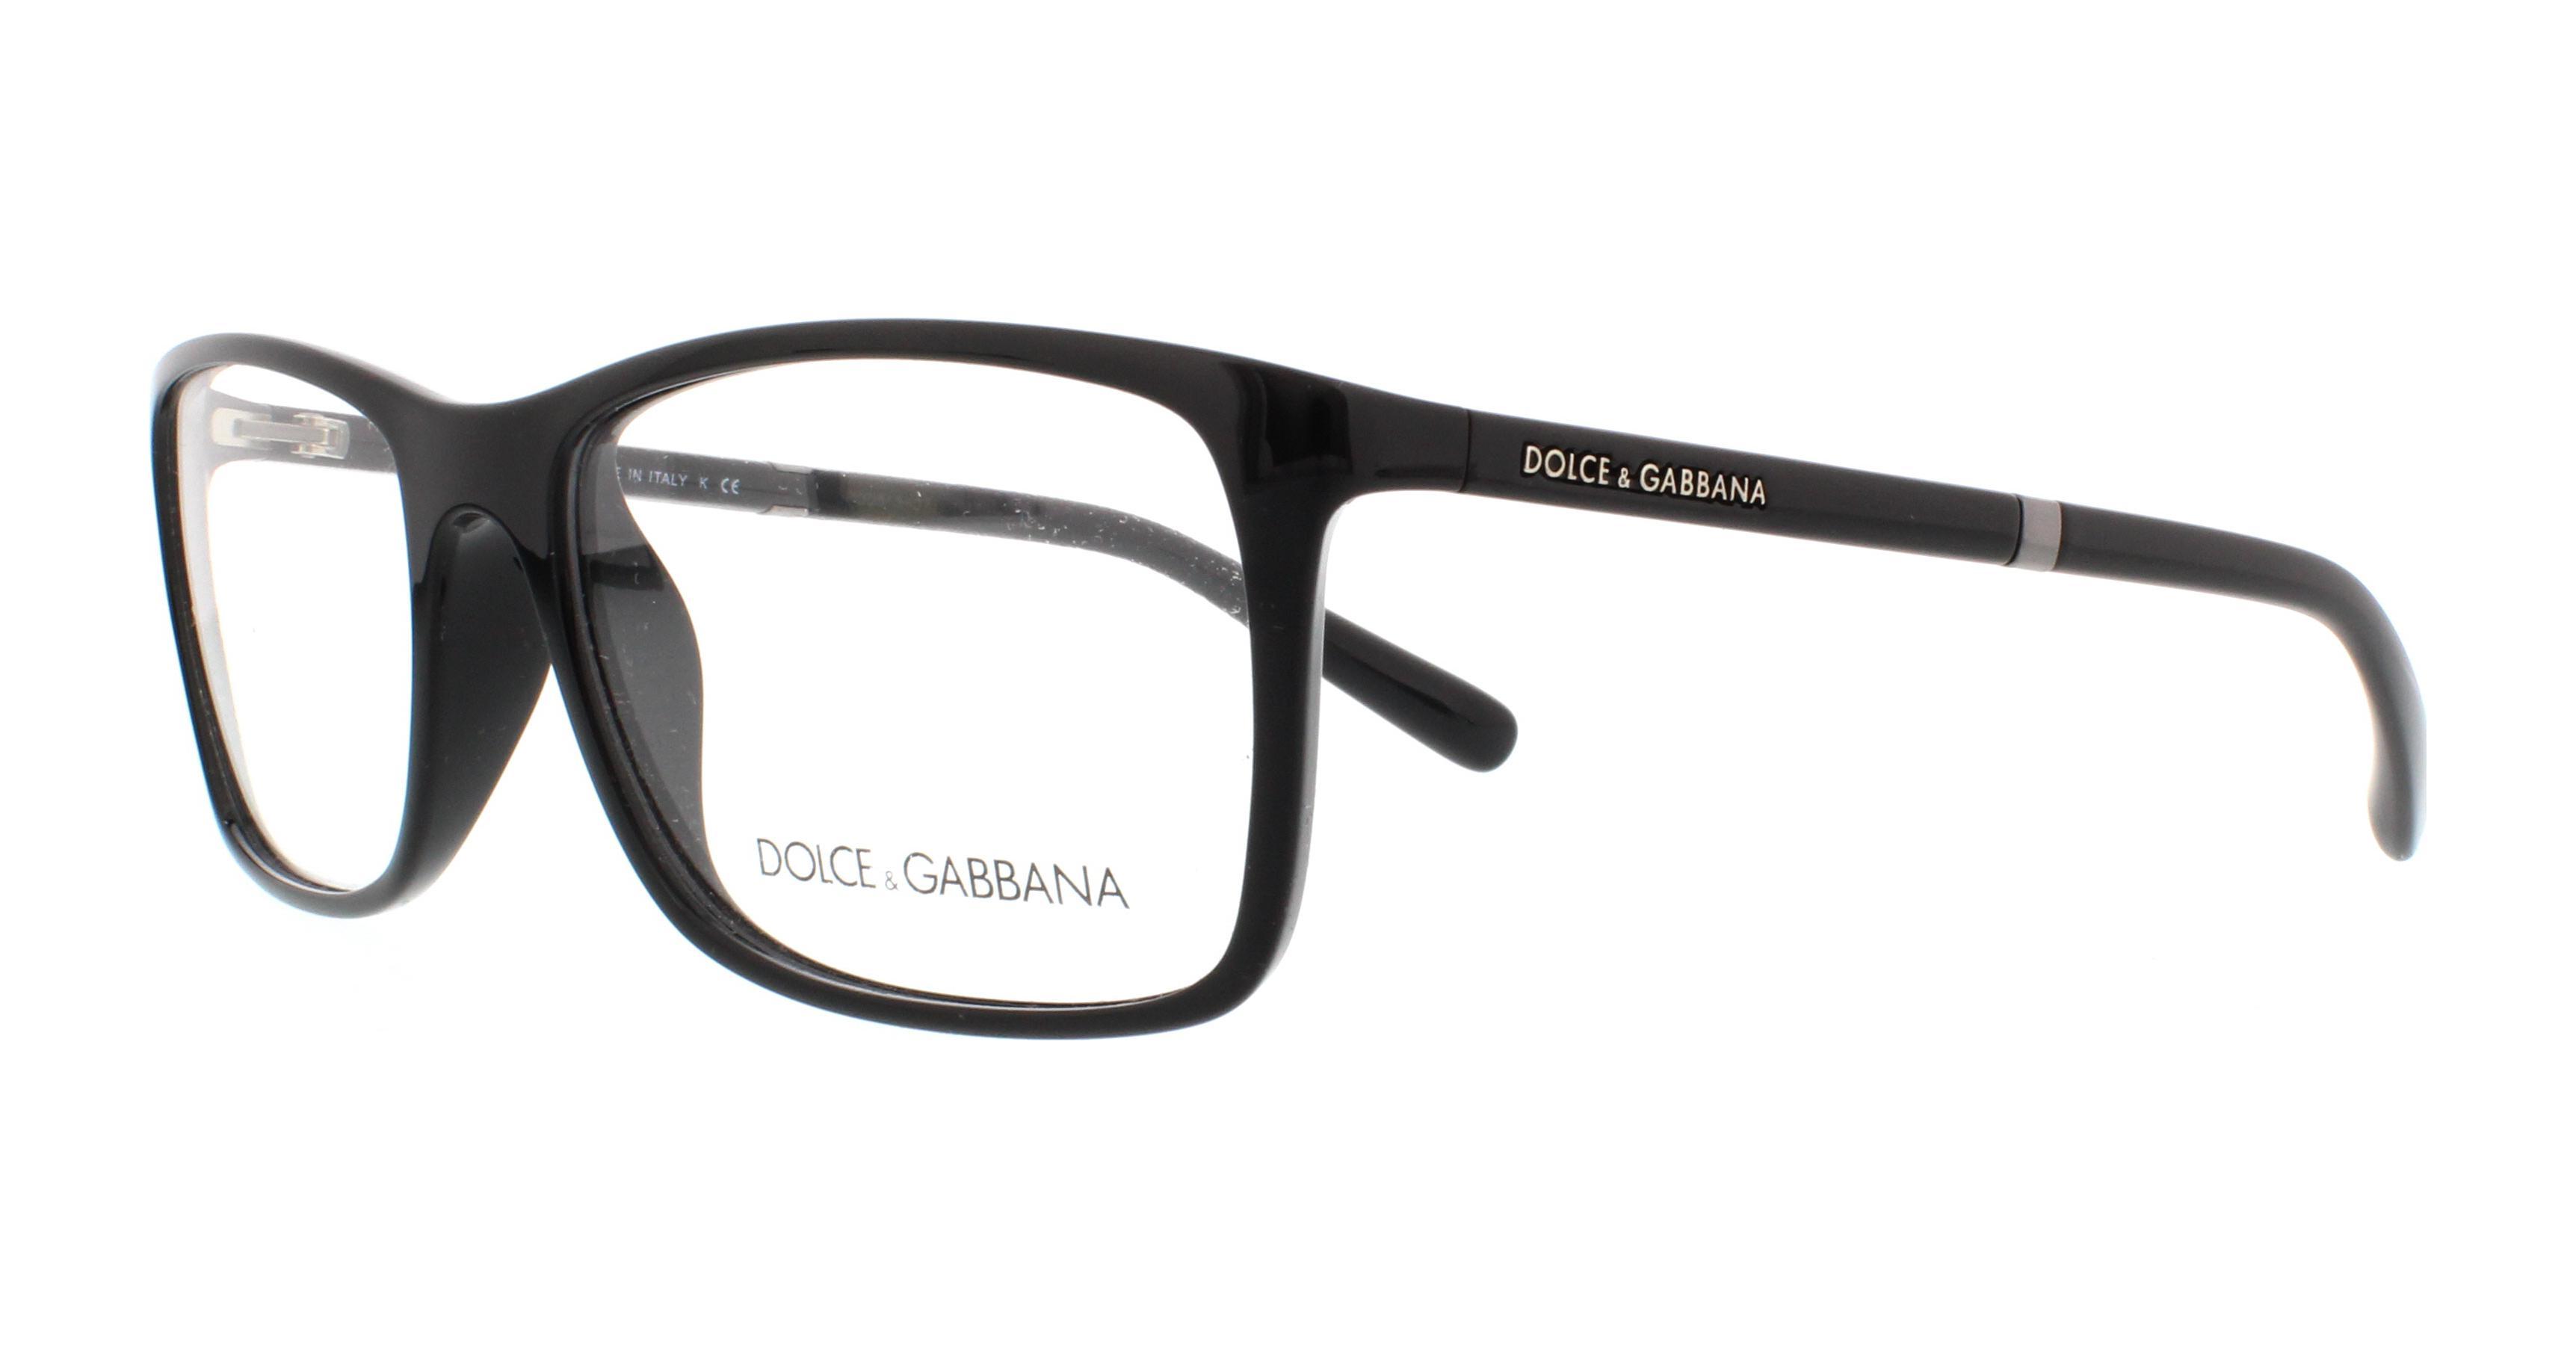 bfac49b4fc Dolce Gabbana Frames - Image Decor and Frame Worldwebresource.Org